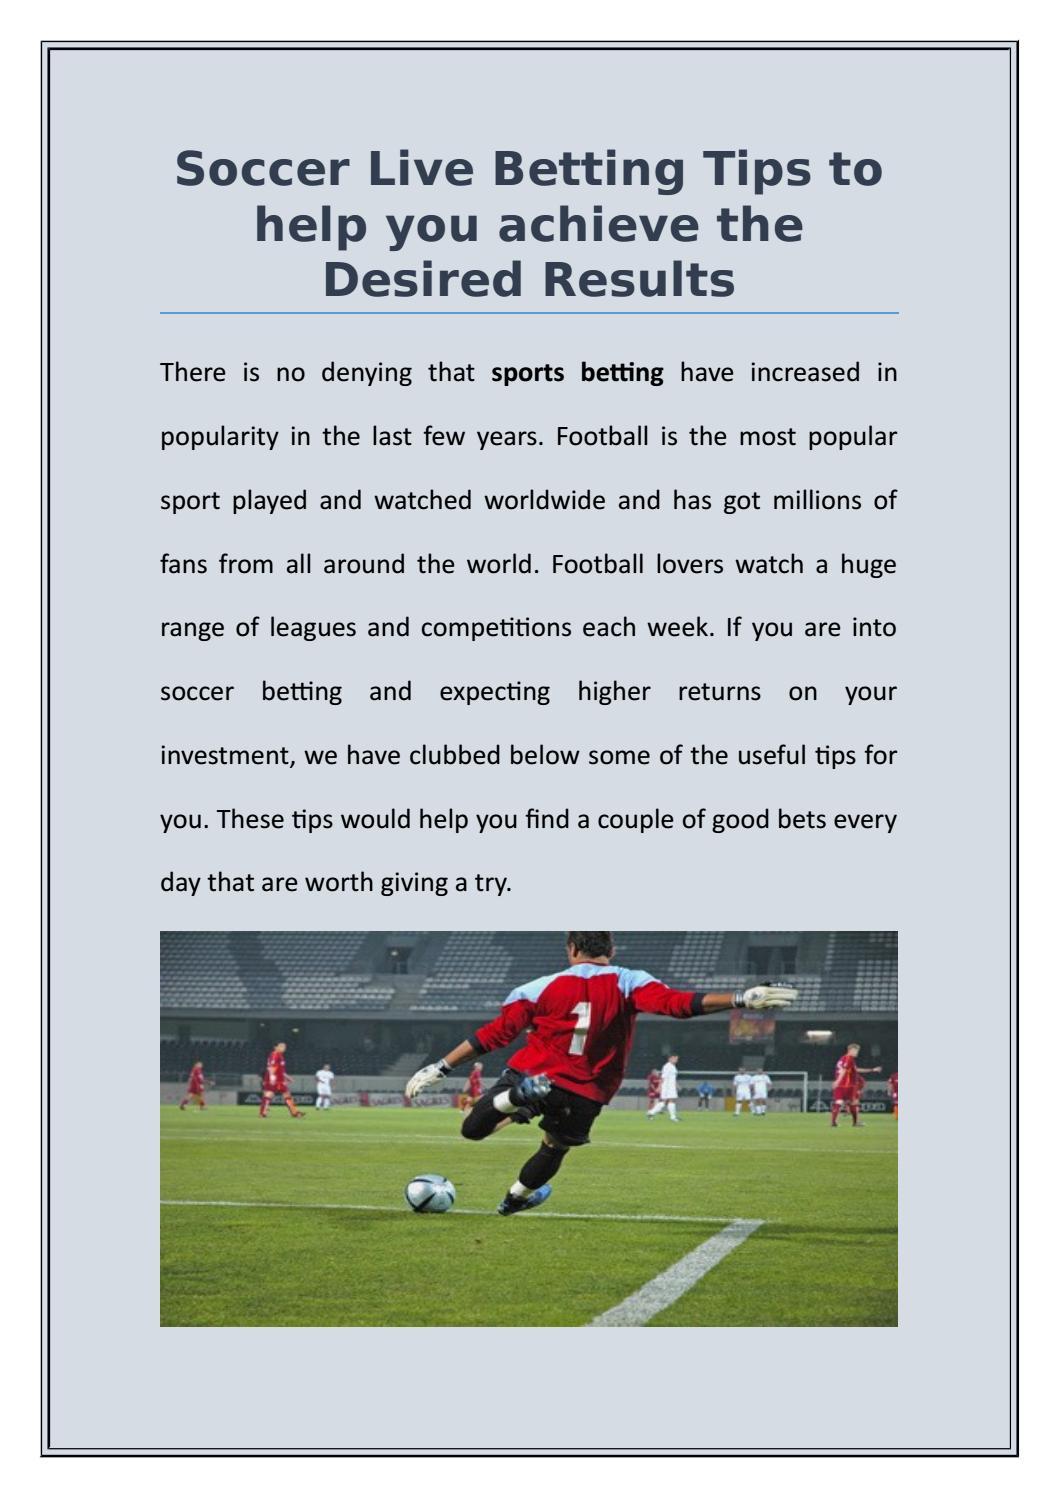 Betting world soccer tips new betting account bonus